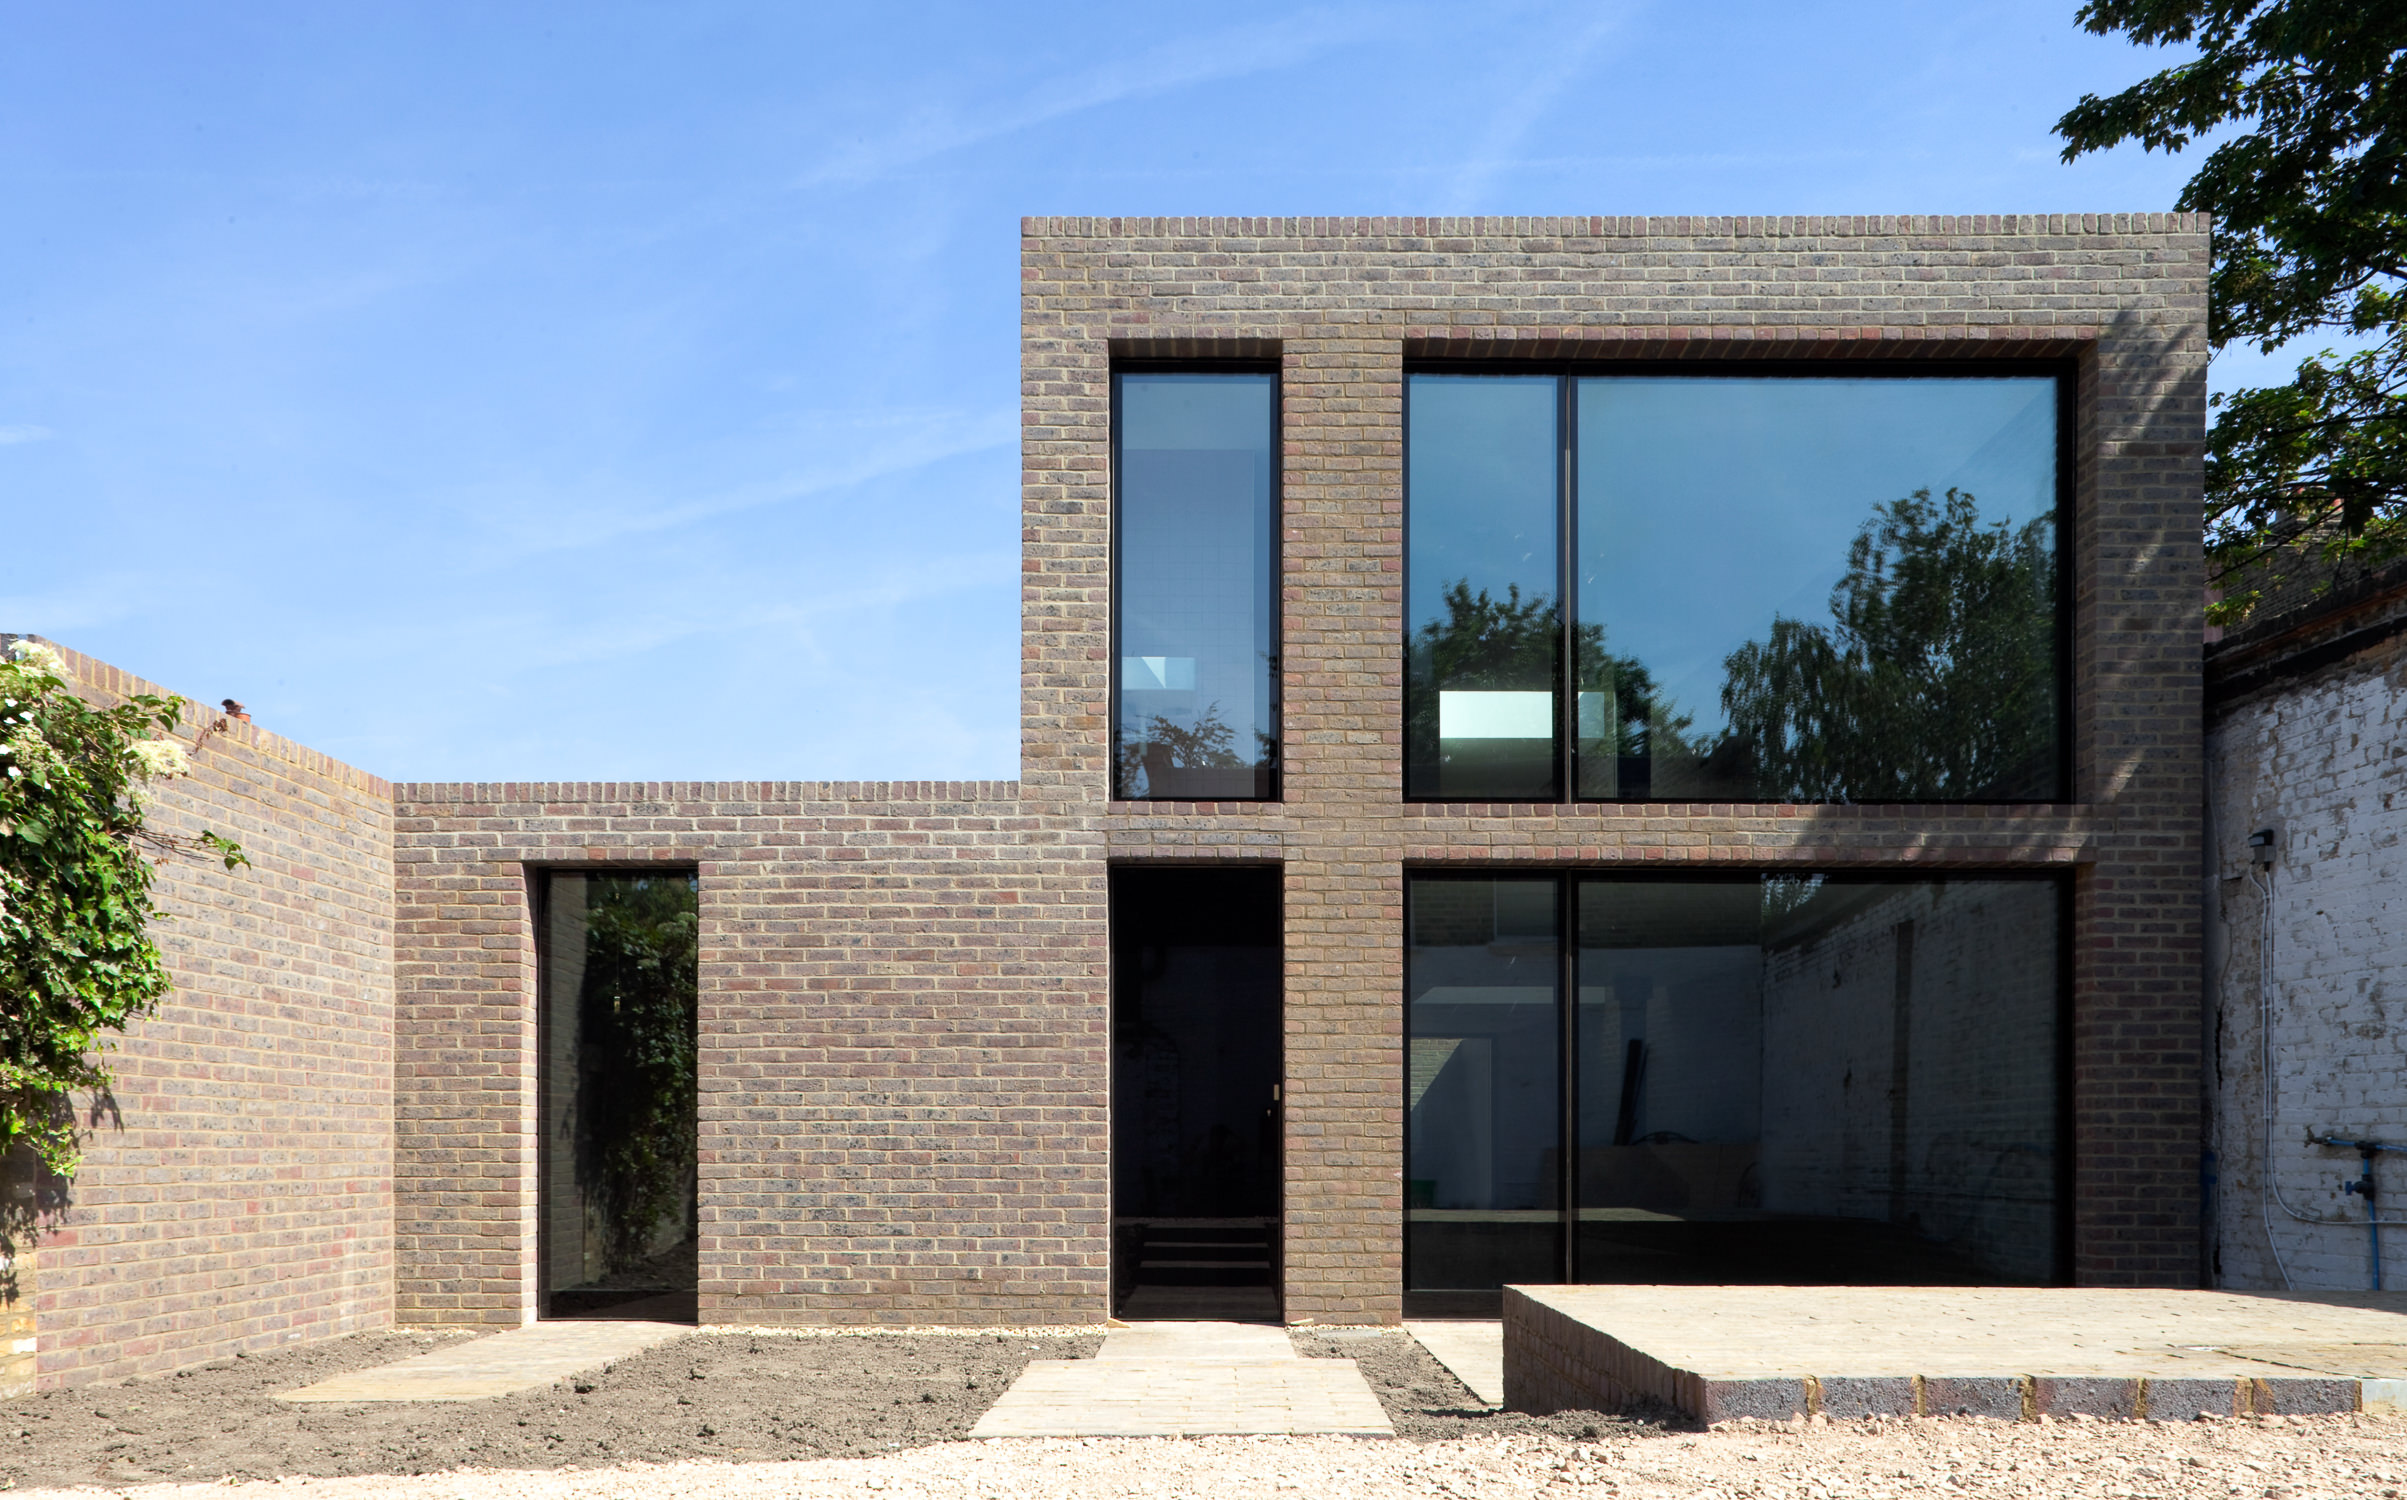 mark-hadden-architecture-photographer-architectuur-interieur-fotografie-london-amsterdam-Kings Avenue_© MH 01b.jpg